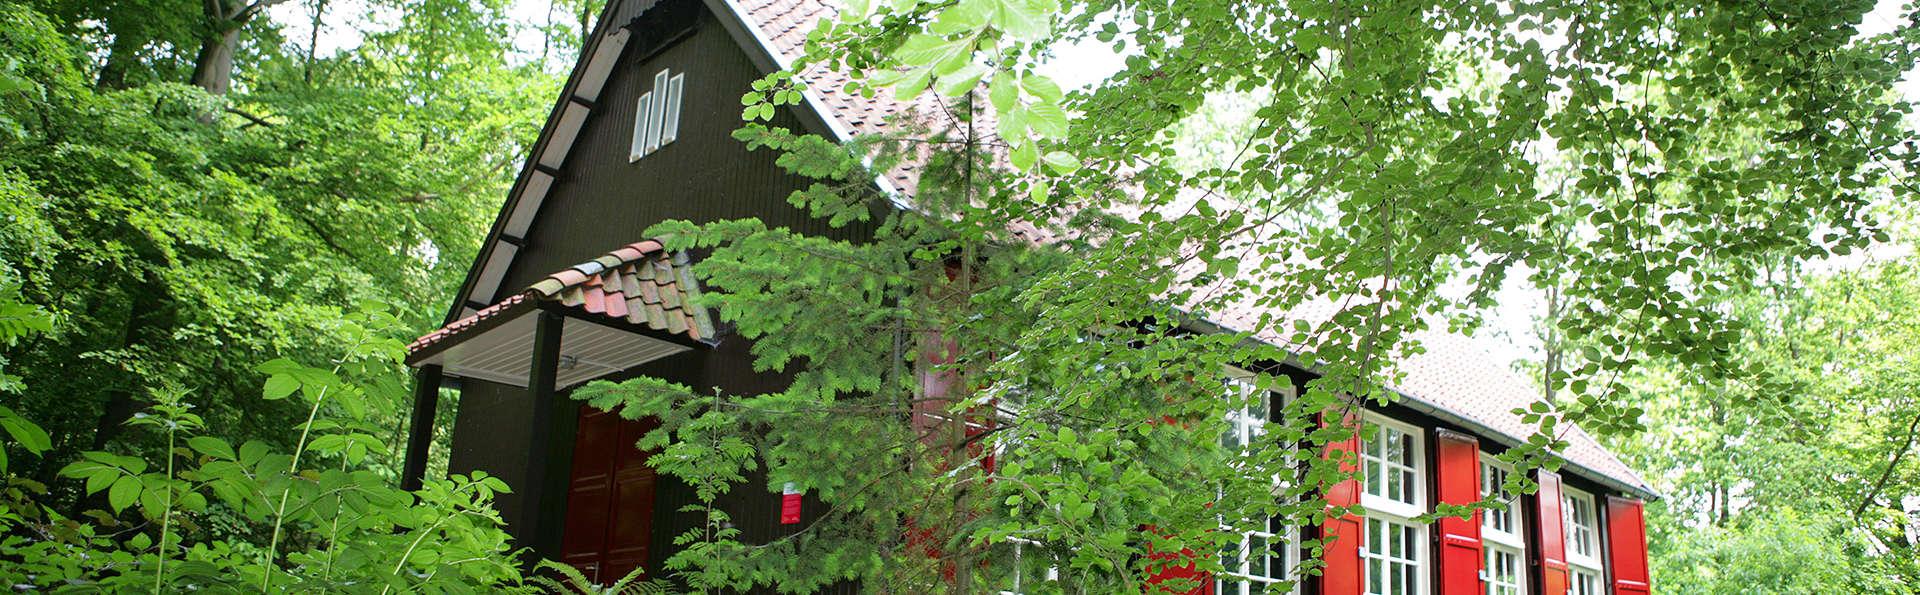 Landgoedhotel Woodbrooke - edit_front2.jpg